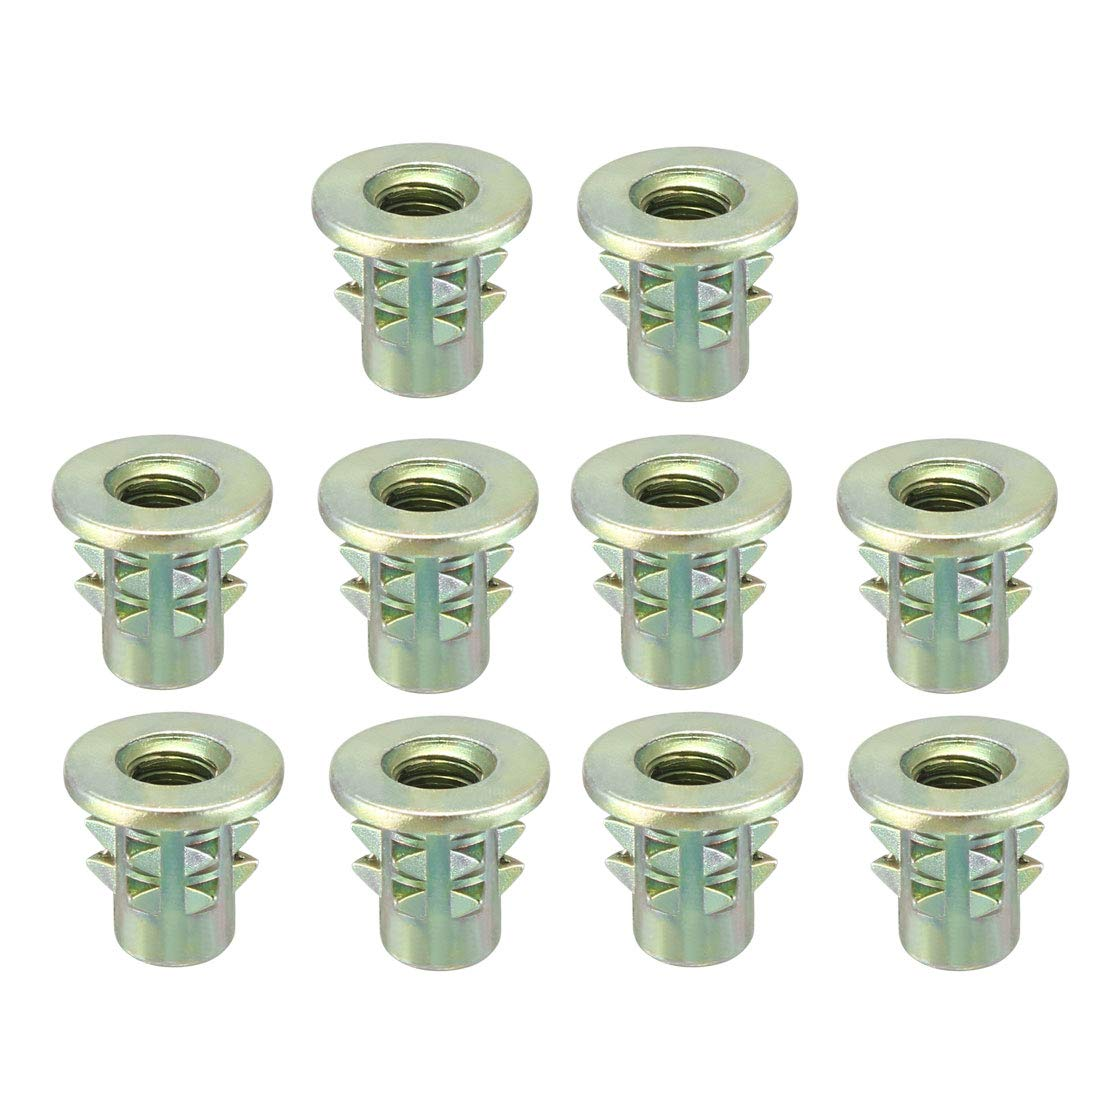 uxcell/® a16042000ux0554 Socket Insert E-Nut M8 x 25Mm Wood Insert Interface Screws Hex Socket Inserts E-Nuts 10 Pcs